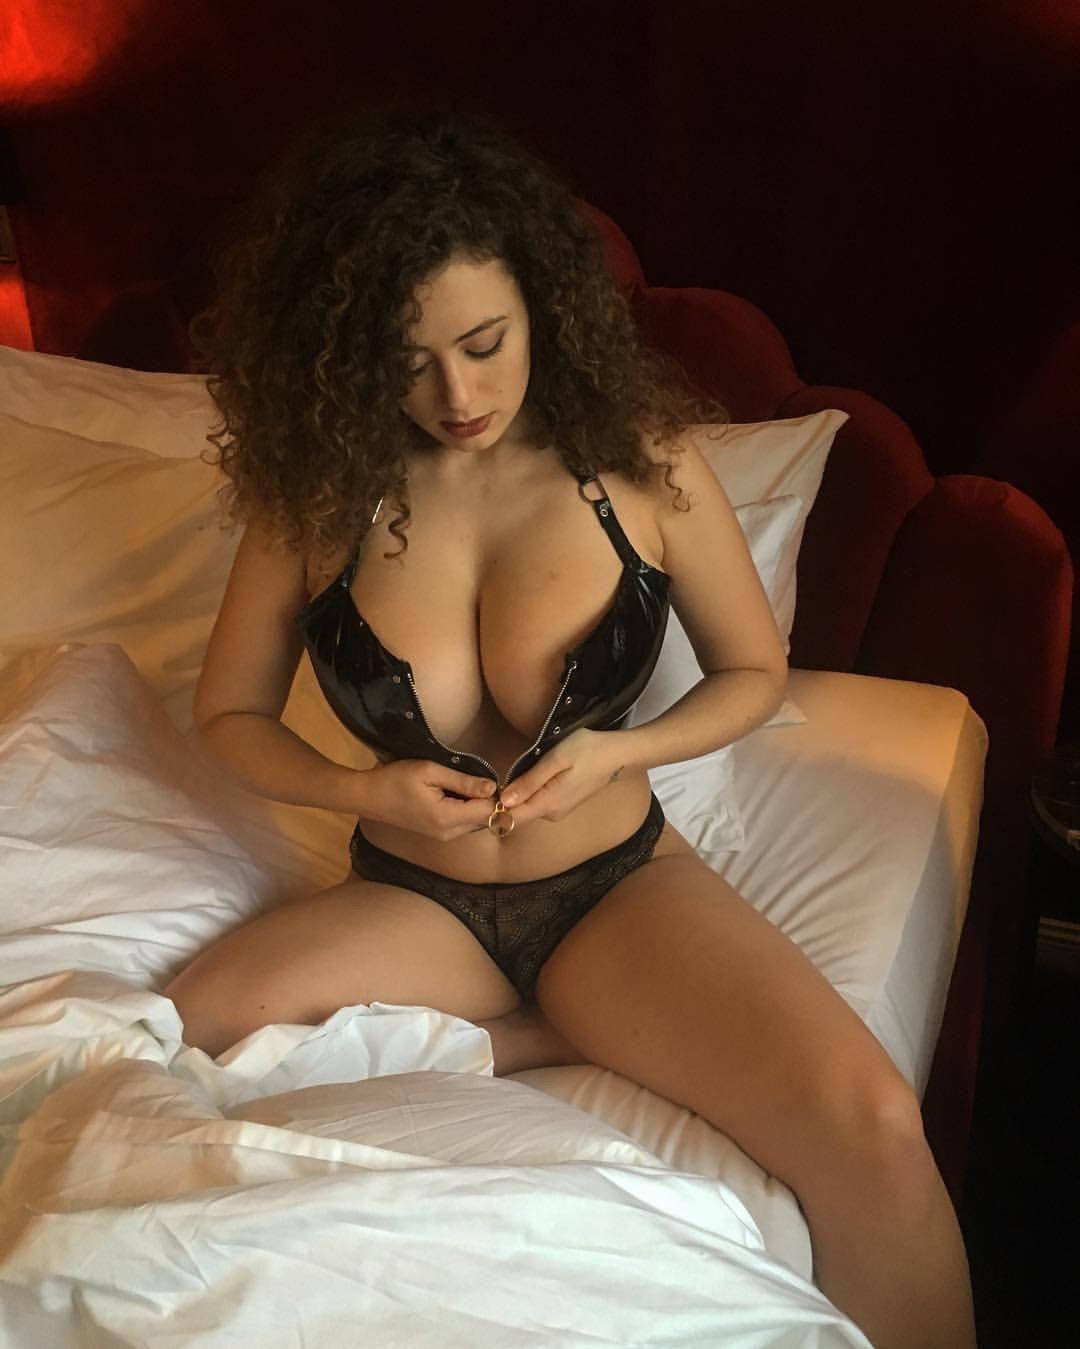 leila lowfire sex video